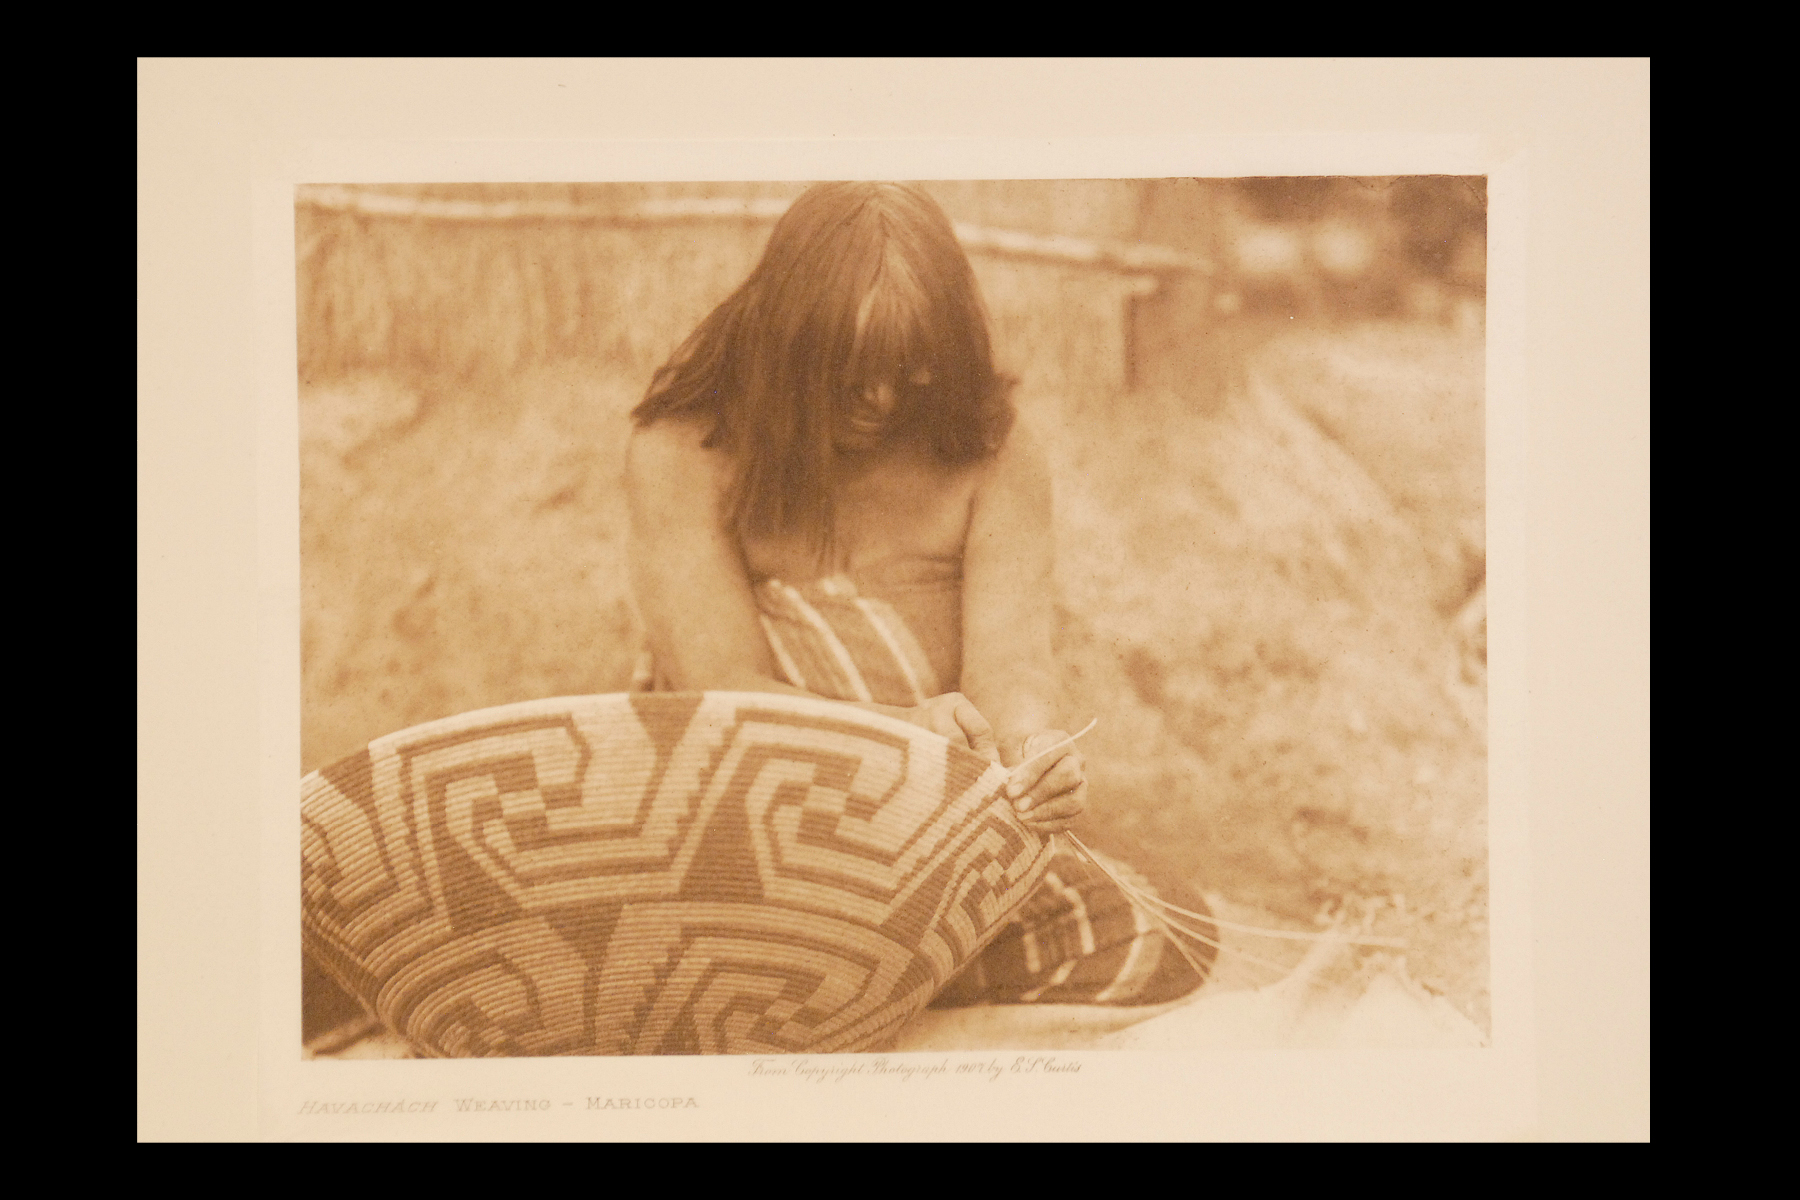 """Havachach Weaving - Maricopa"" 1907 Vol.2 Tissue Print, Vintage Photogravure"